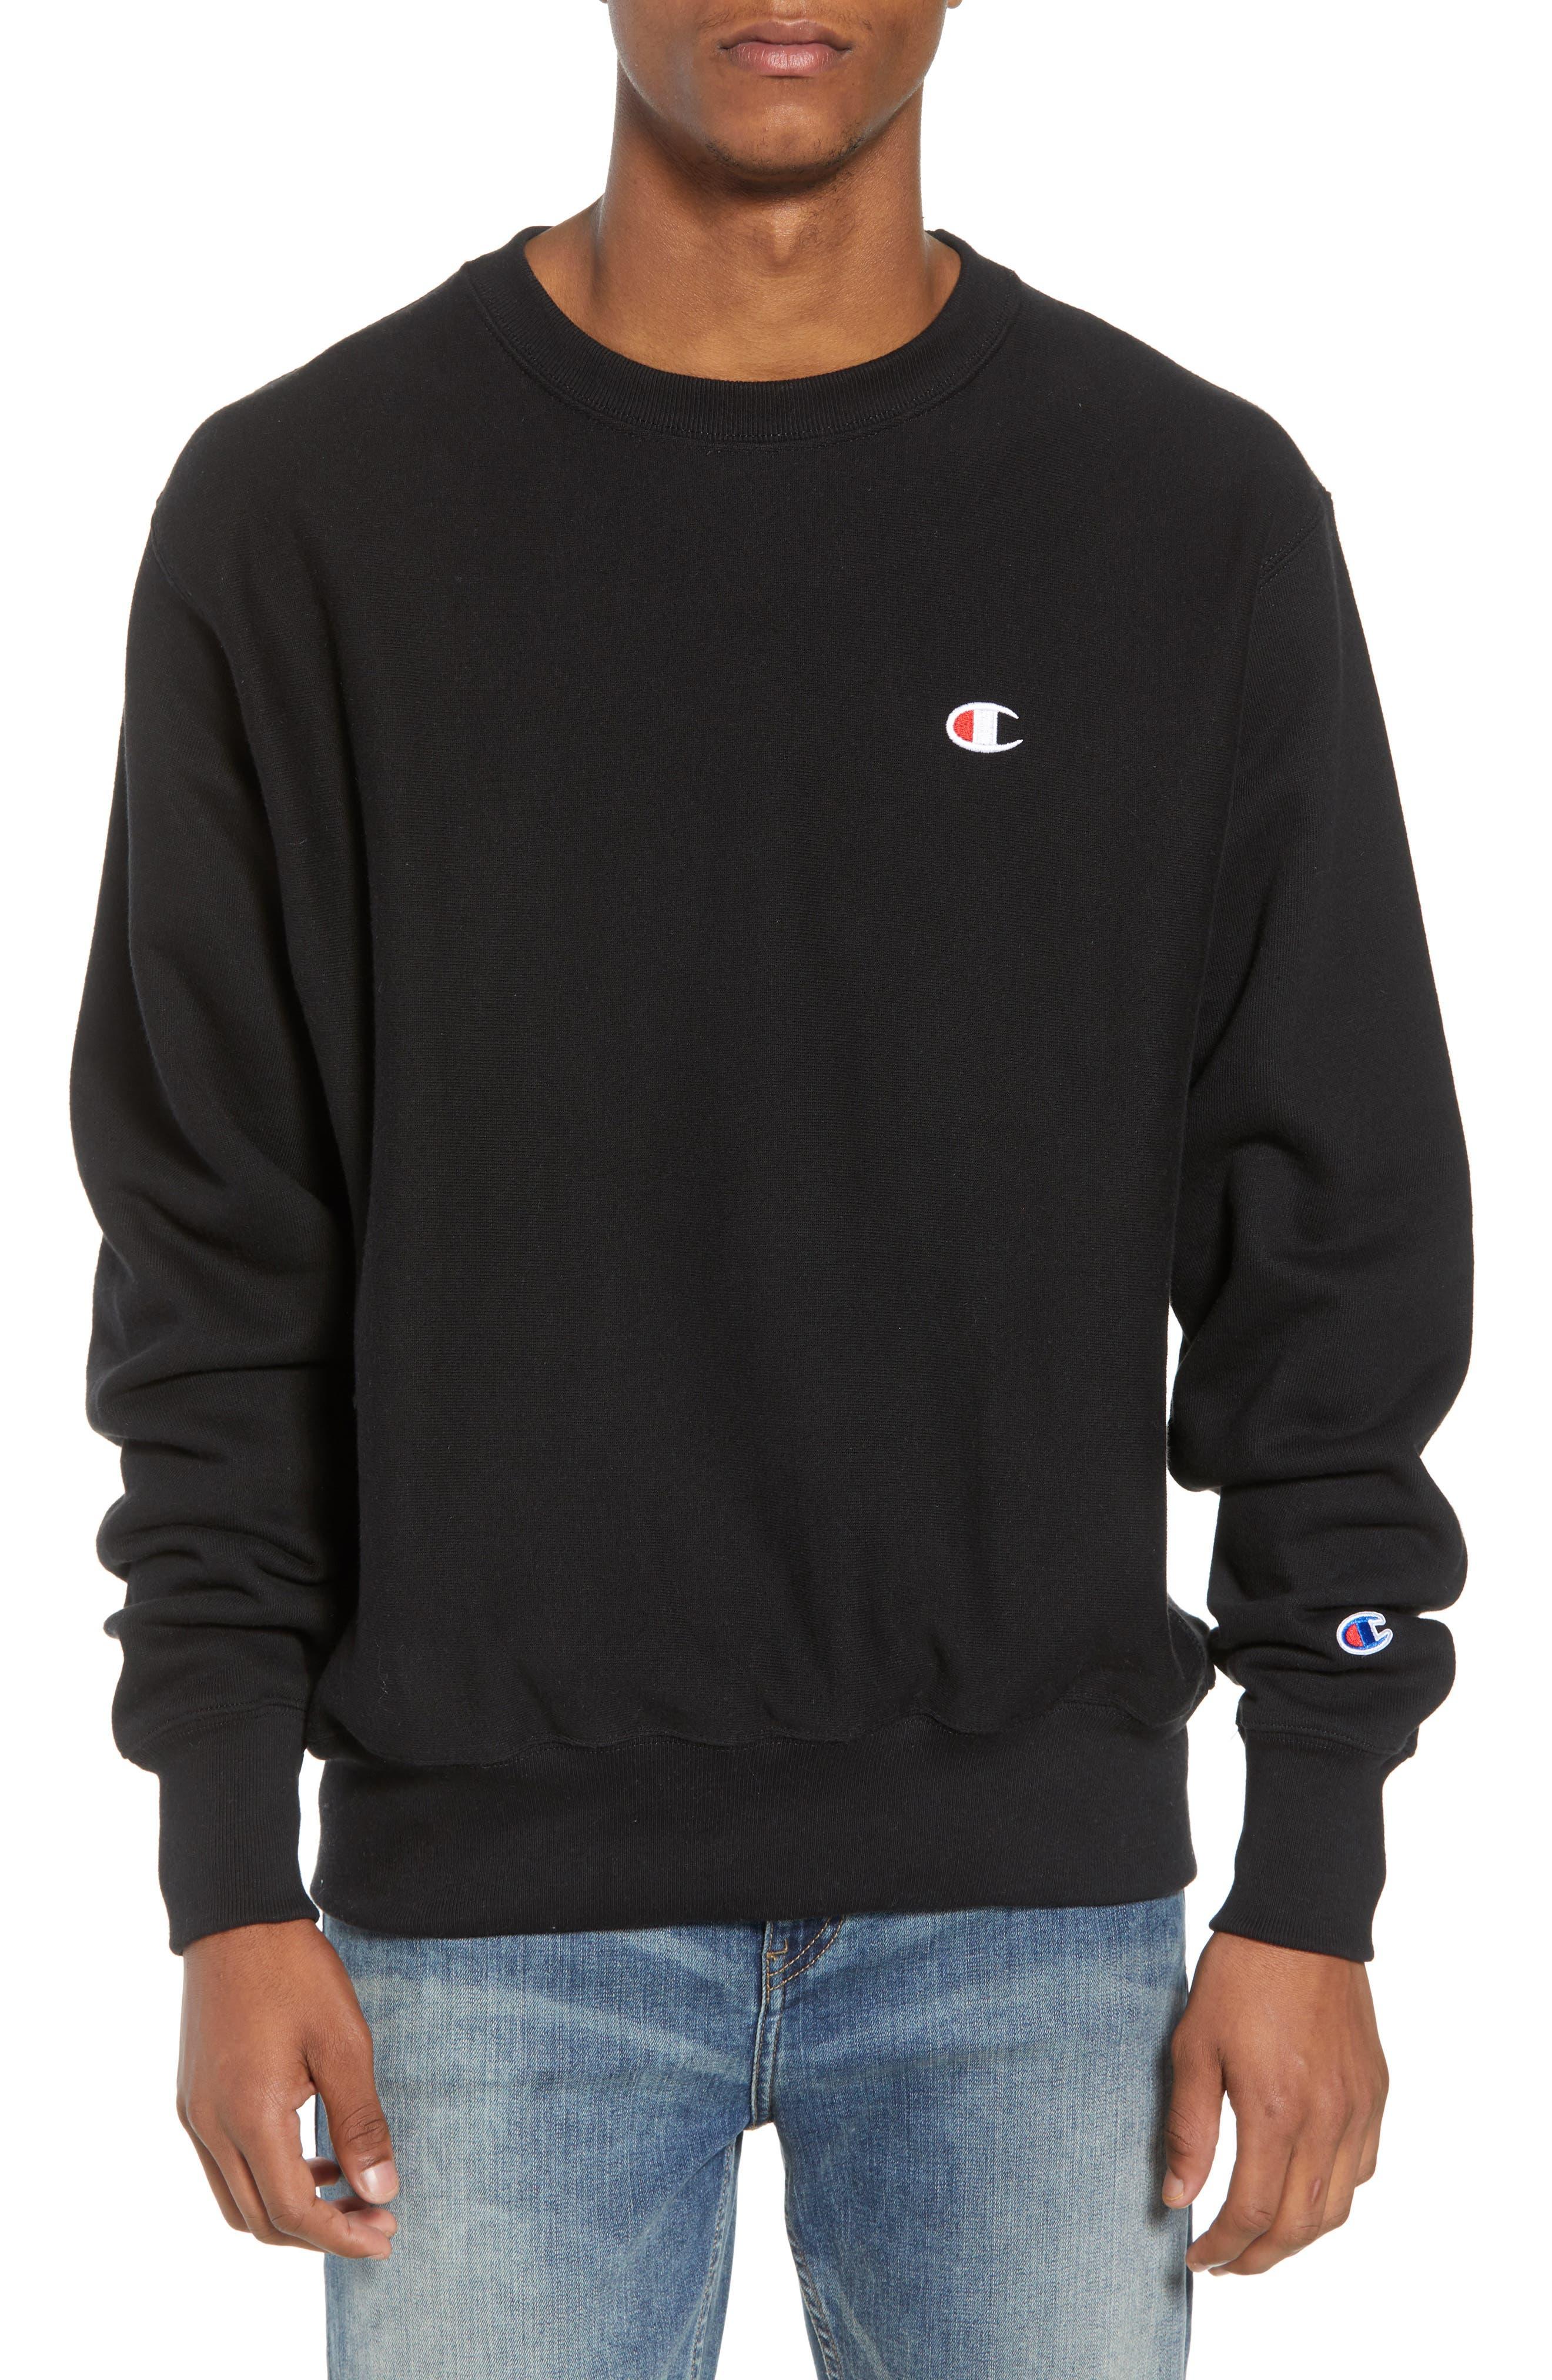 Reverse Weave Sweatshirt,                         Main,                         color, Black